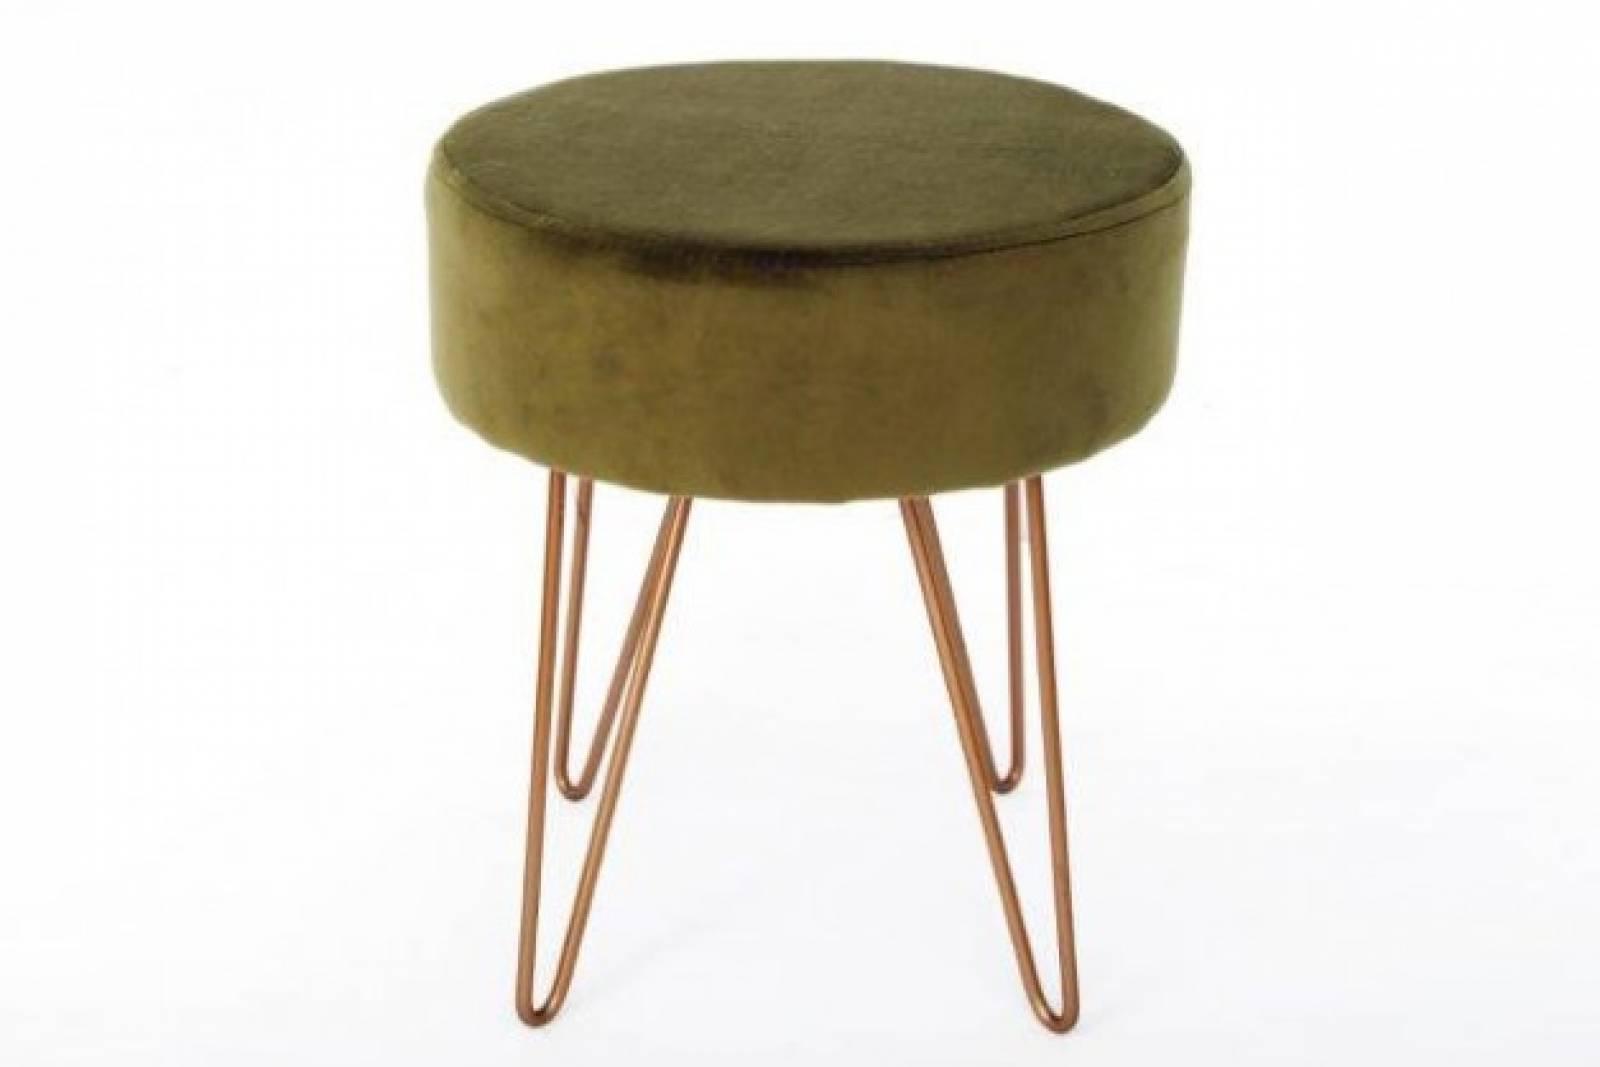 Green Velvet Circular Stool With Gold Hairpin Legs